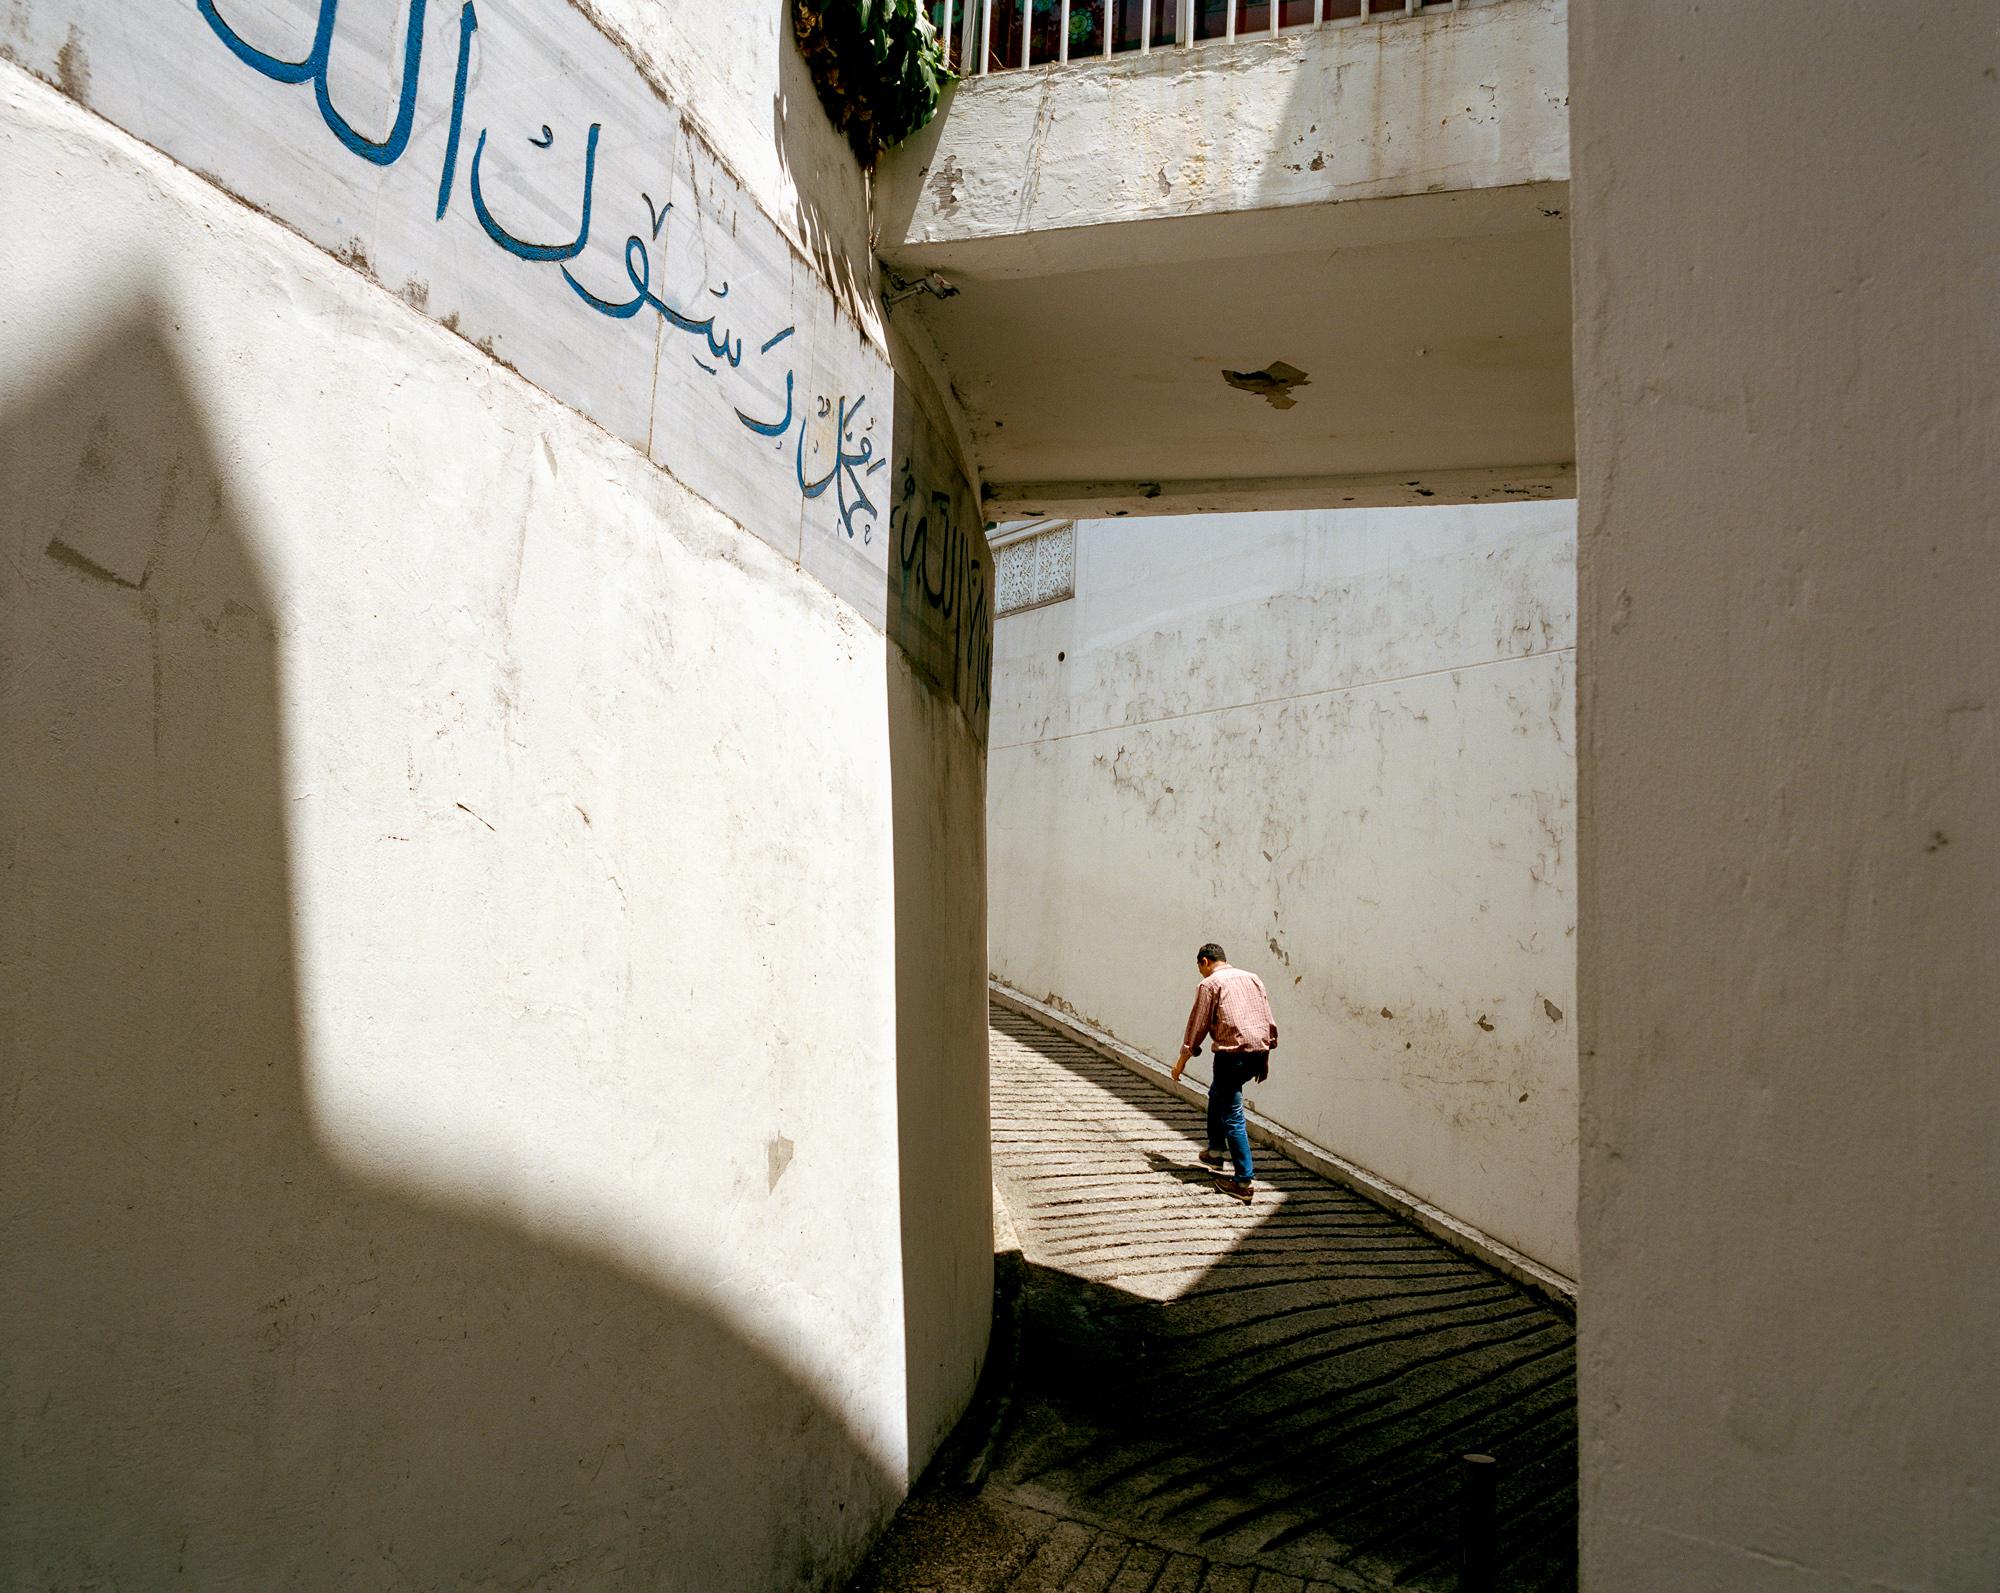 RaduDiaconu_South Korean Muslims_Man - Masjid.jpg